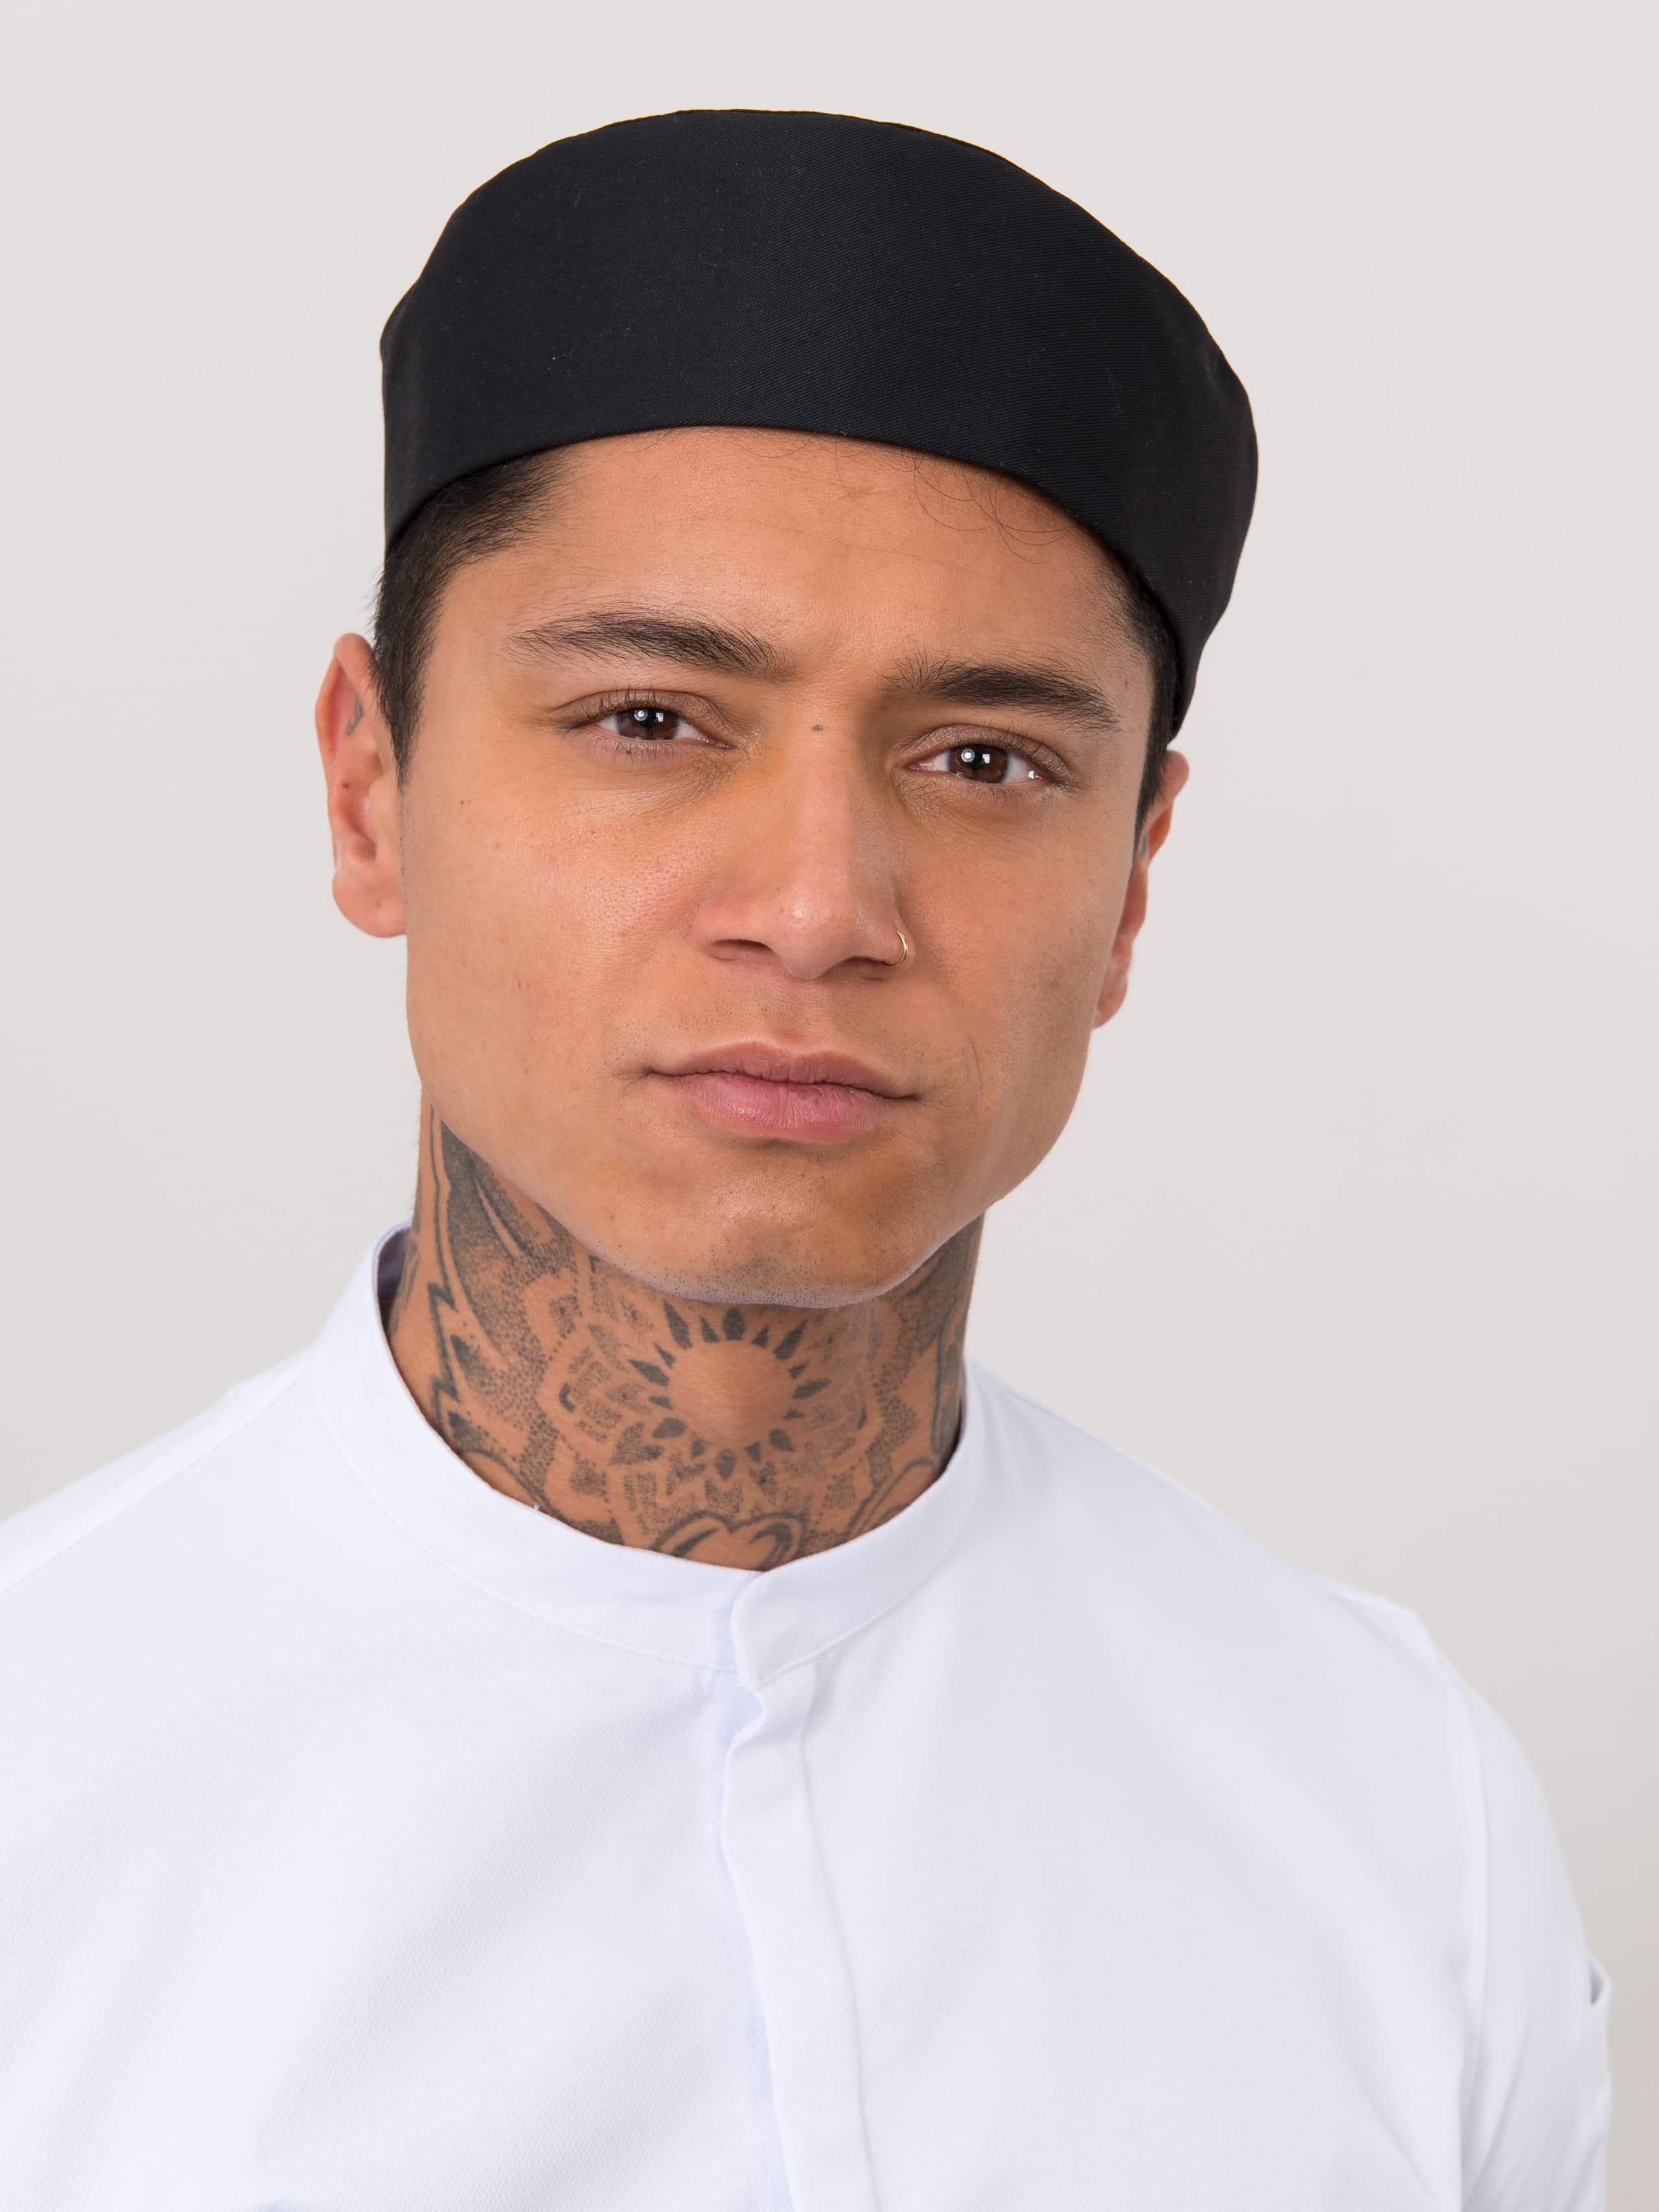 Chef Hat Fez Black